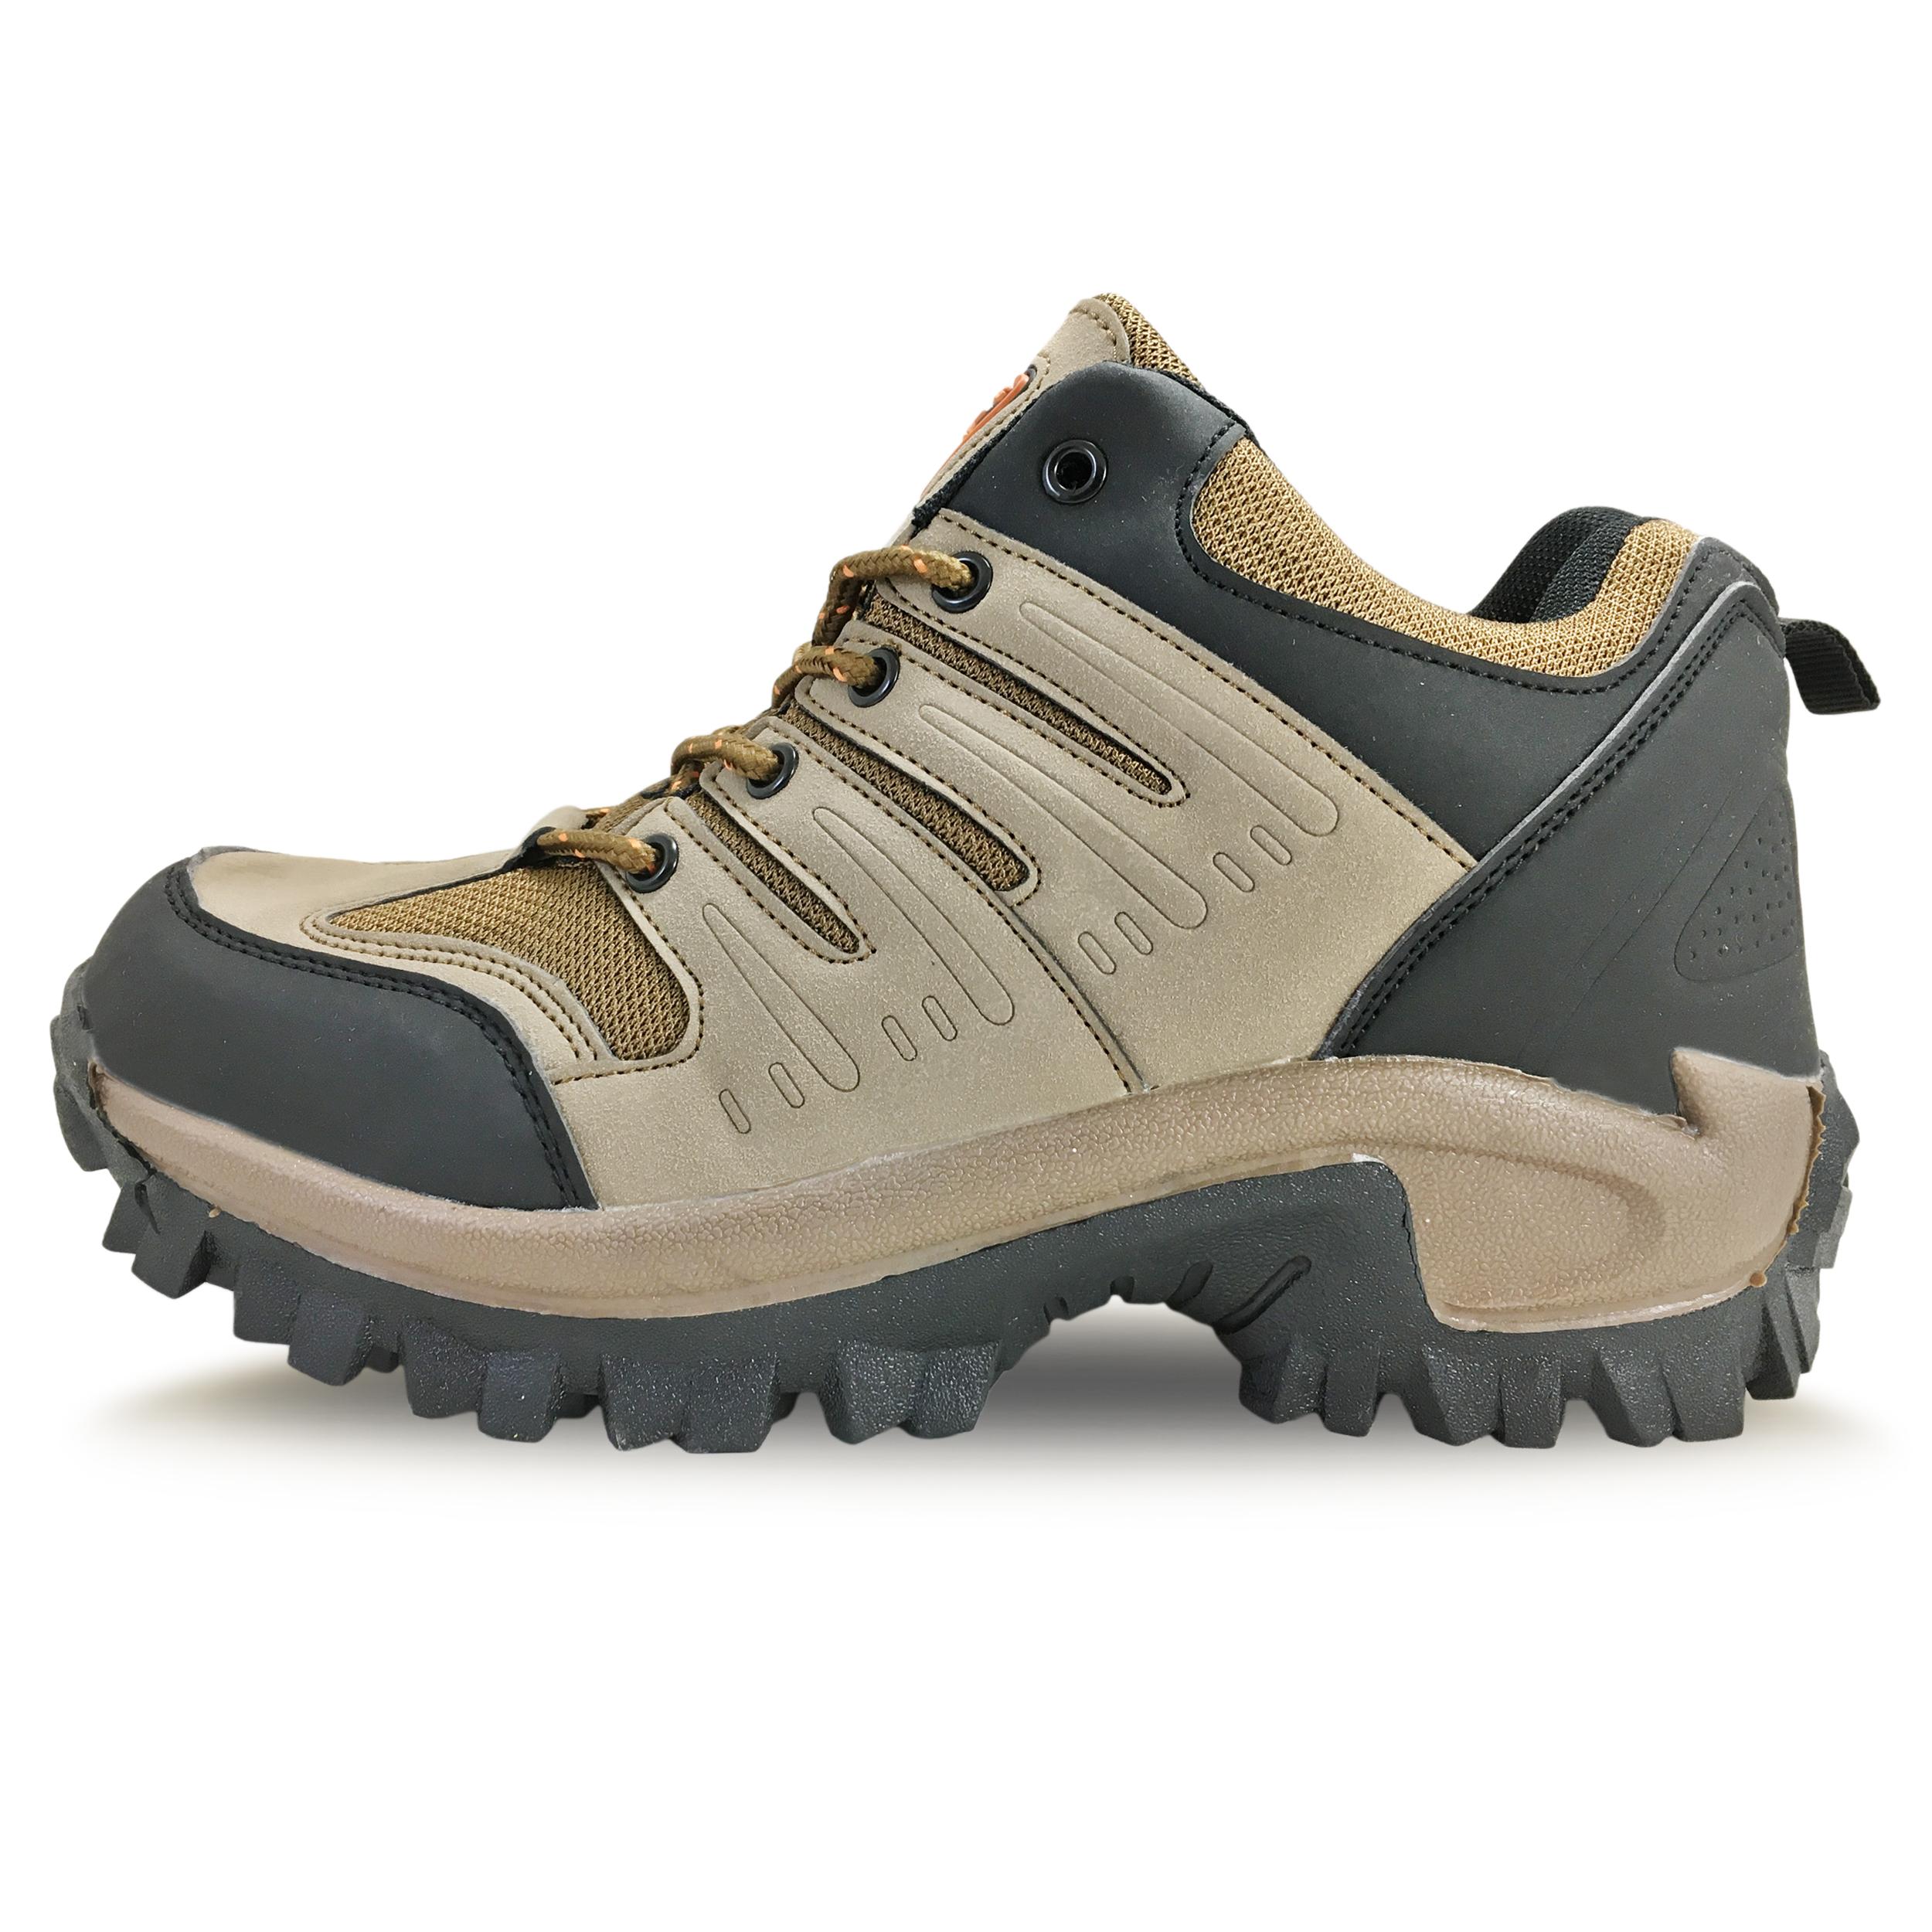 قیمت کفش کوهنوردی مردانه جیاکسیانگ کد SJ204